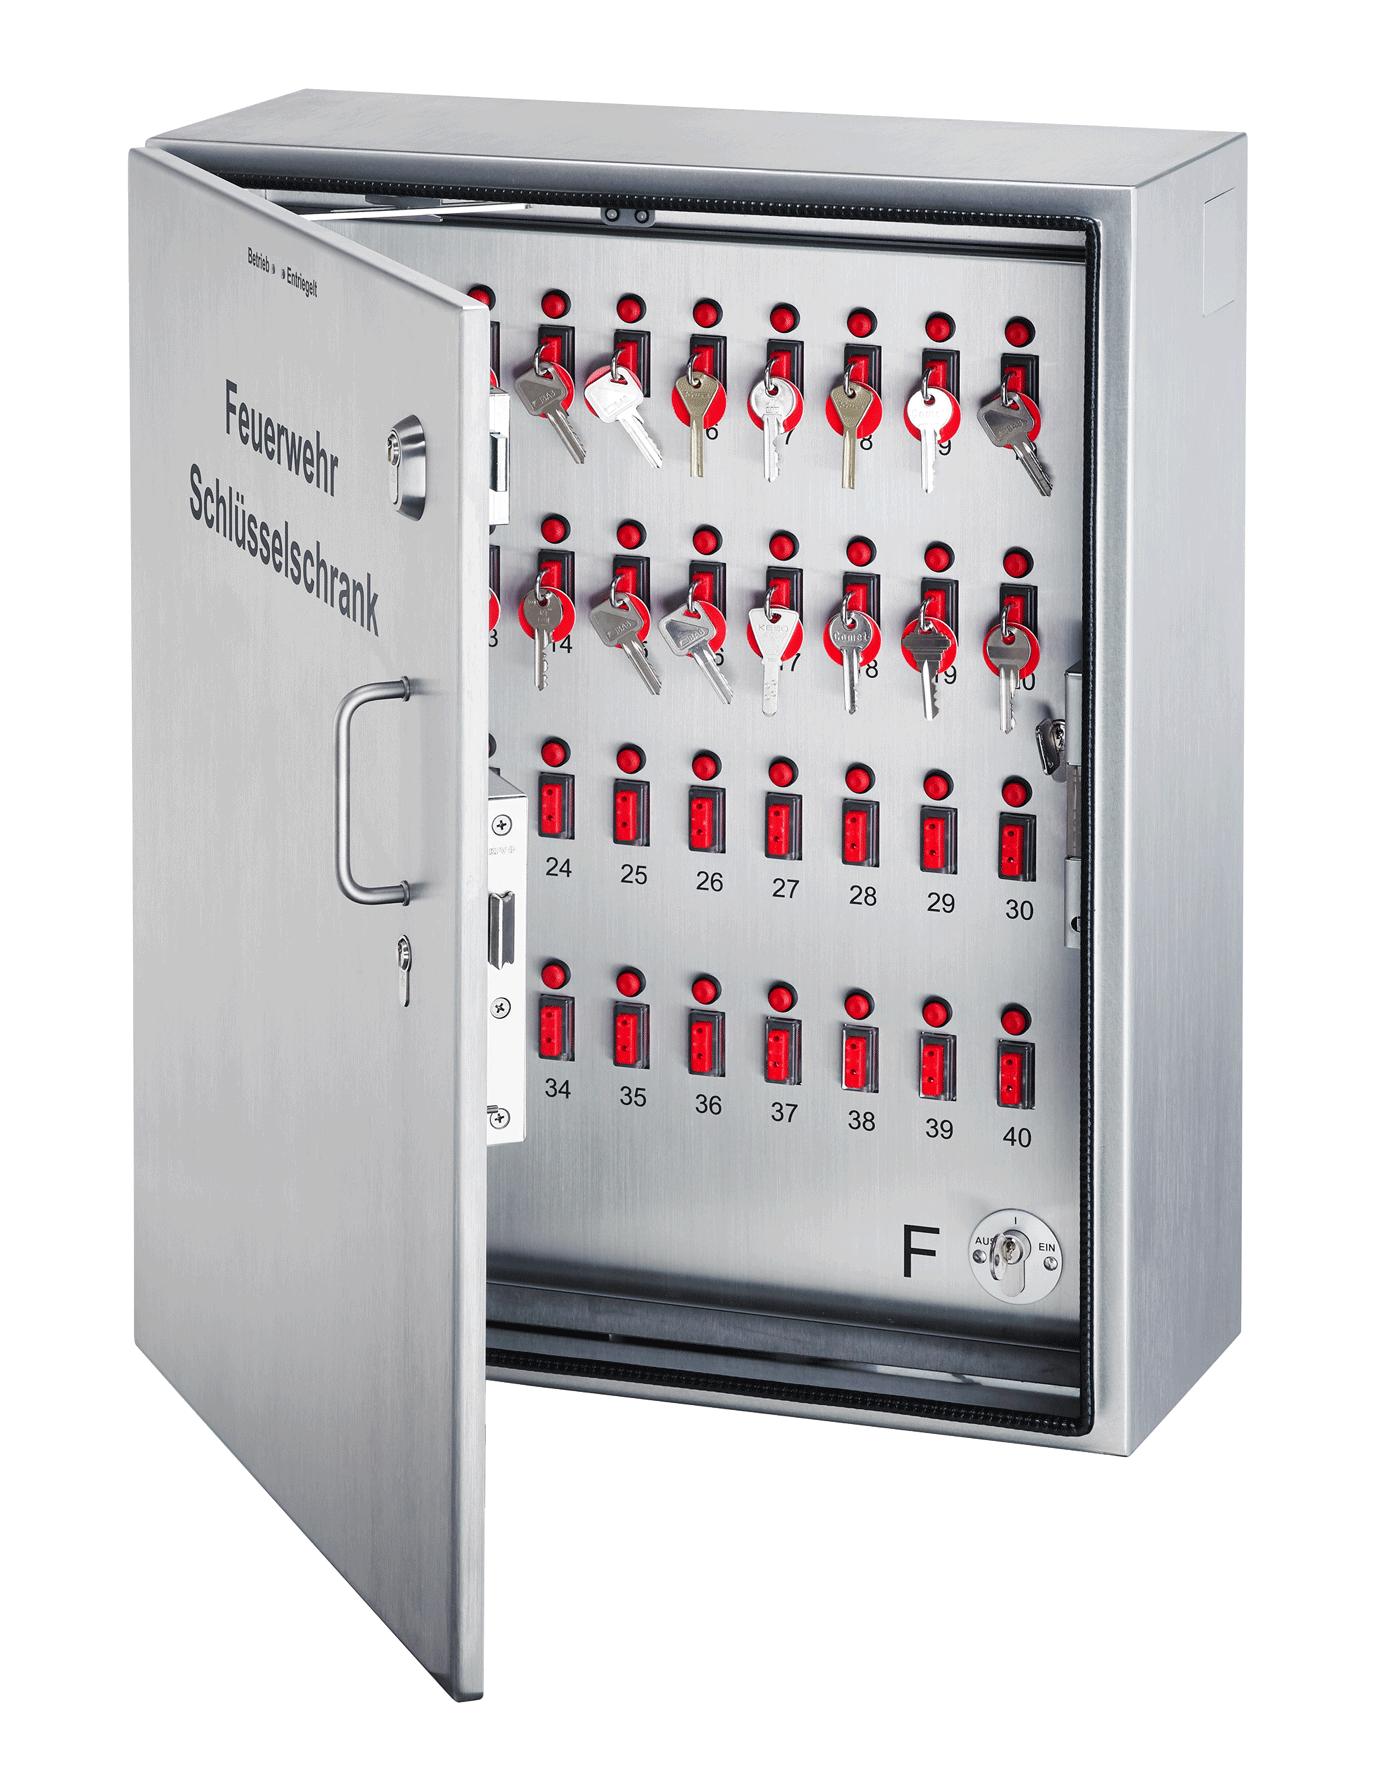 Kruse Sicherheit - Kategoriebild KRUSE FW-SchlüsselSchränke (FSS)